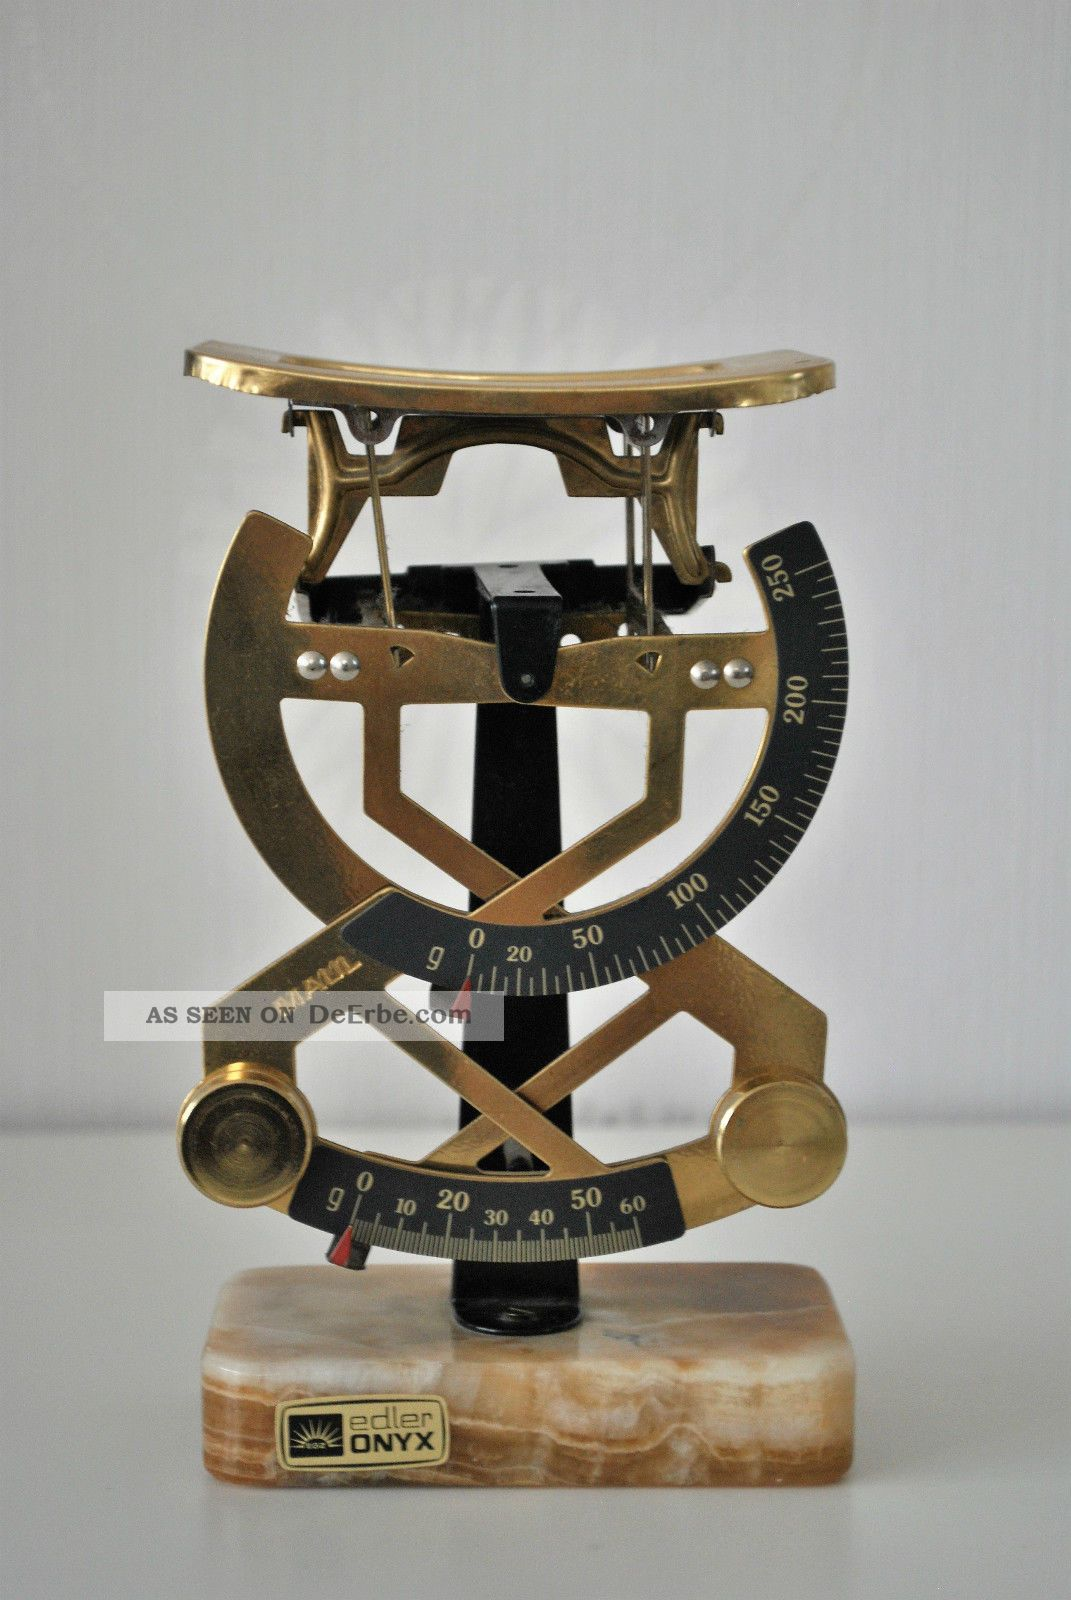 Maul Briefwaage Bilateral,  Mit Onyx Standfuß Kaufleute & Krämer Bild